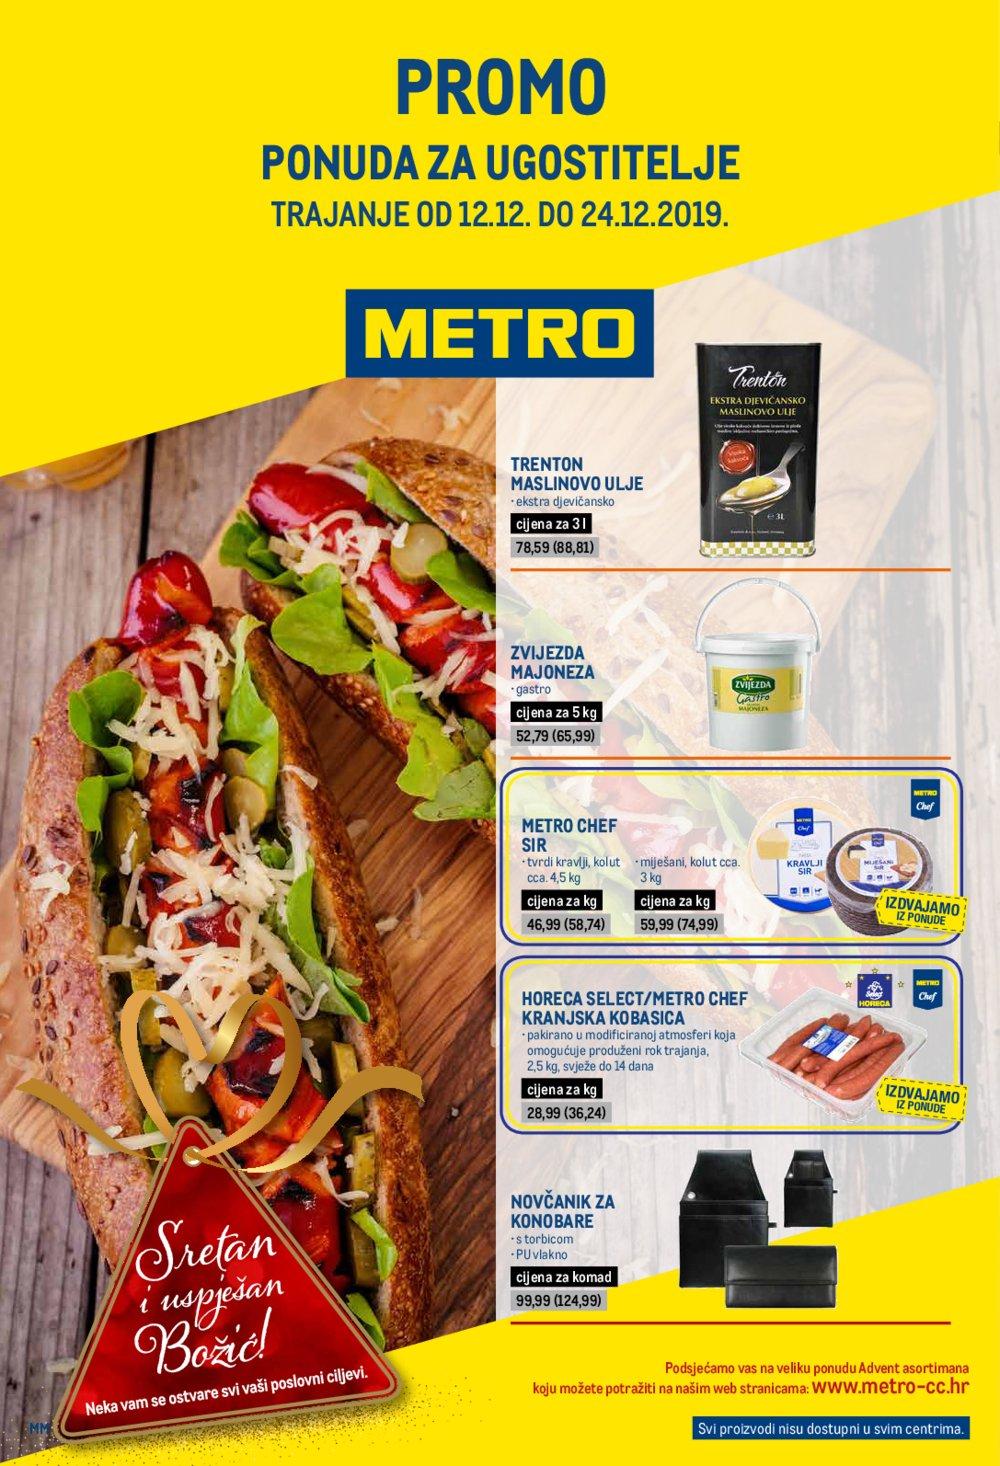 Metro katalog Posebna ponuda za ugostitelje 12.12.-24.12.2019.